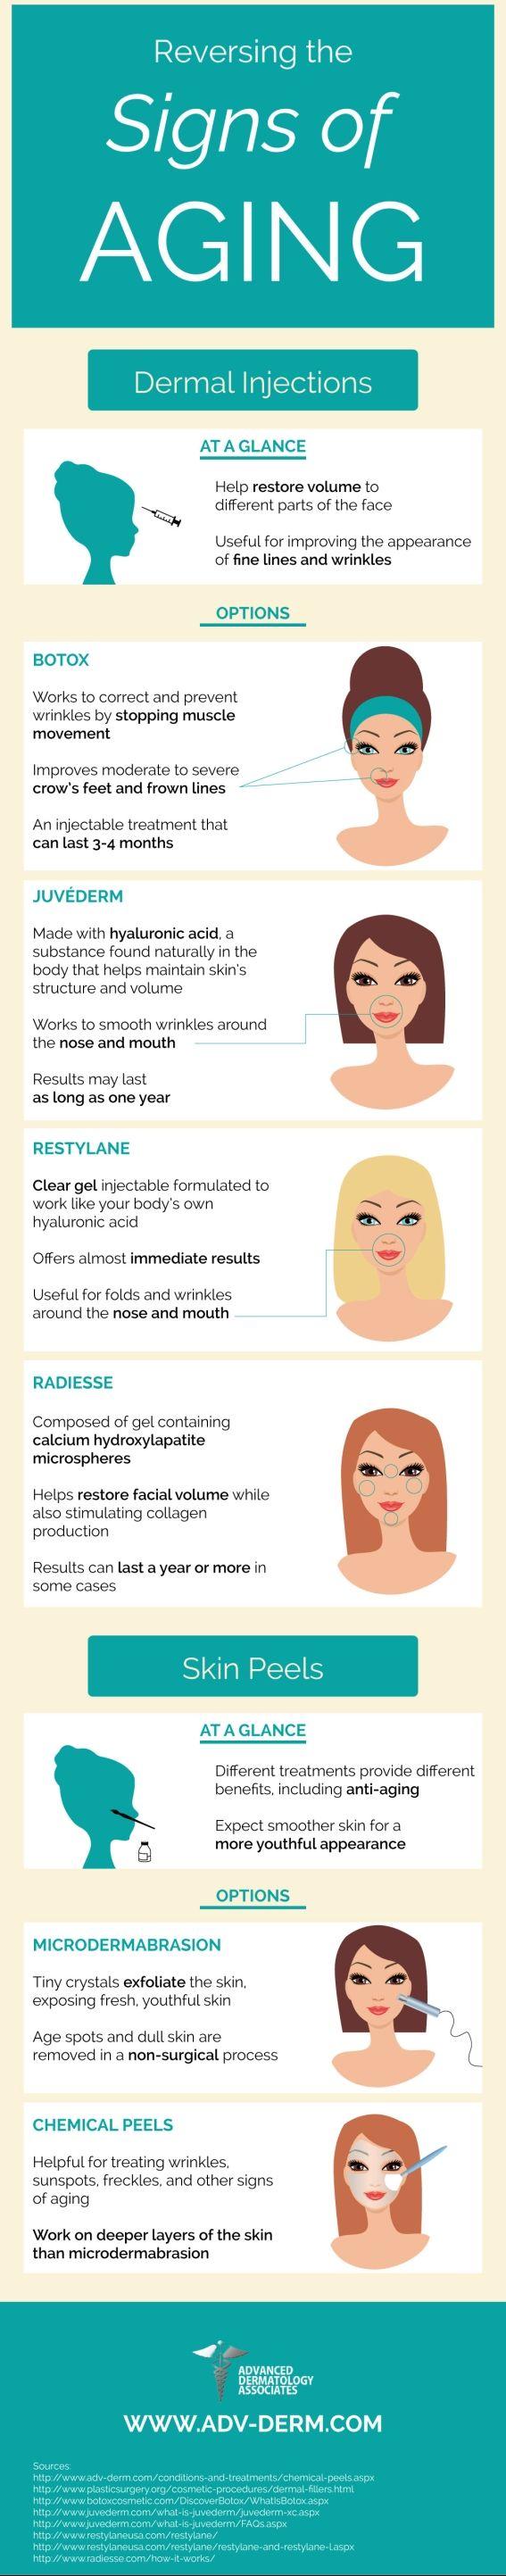 Wrinkels & fillers to correct them. #infographic #wellnesskliniek